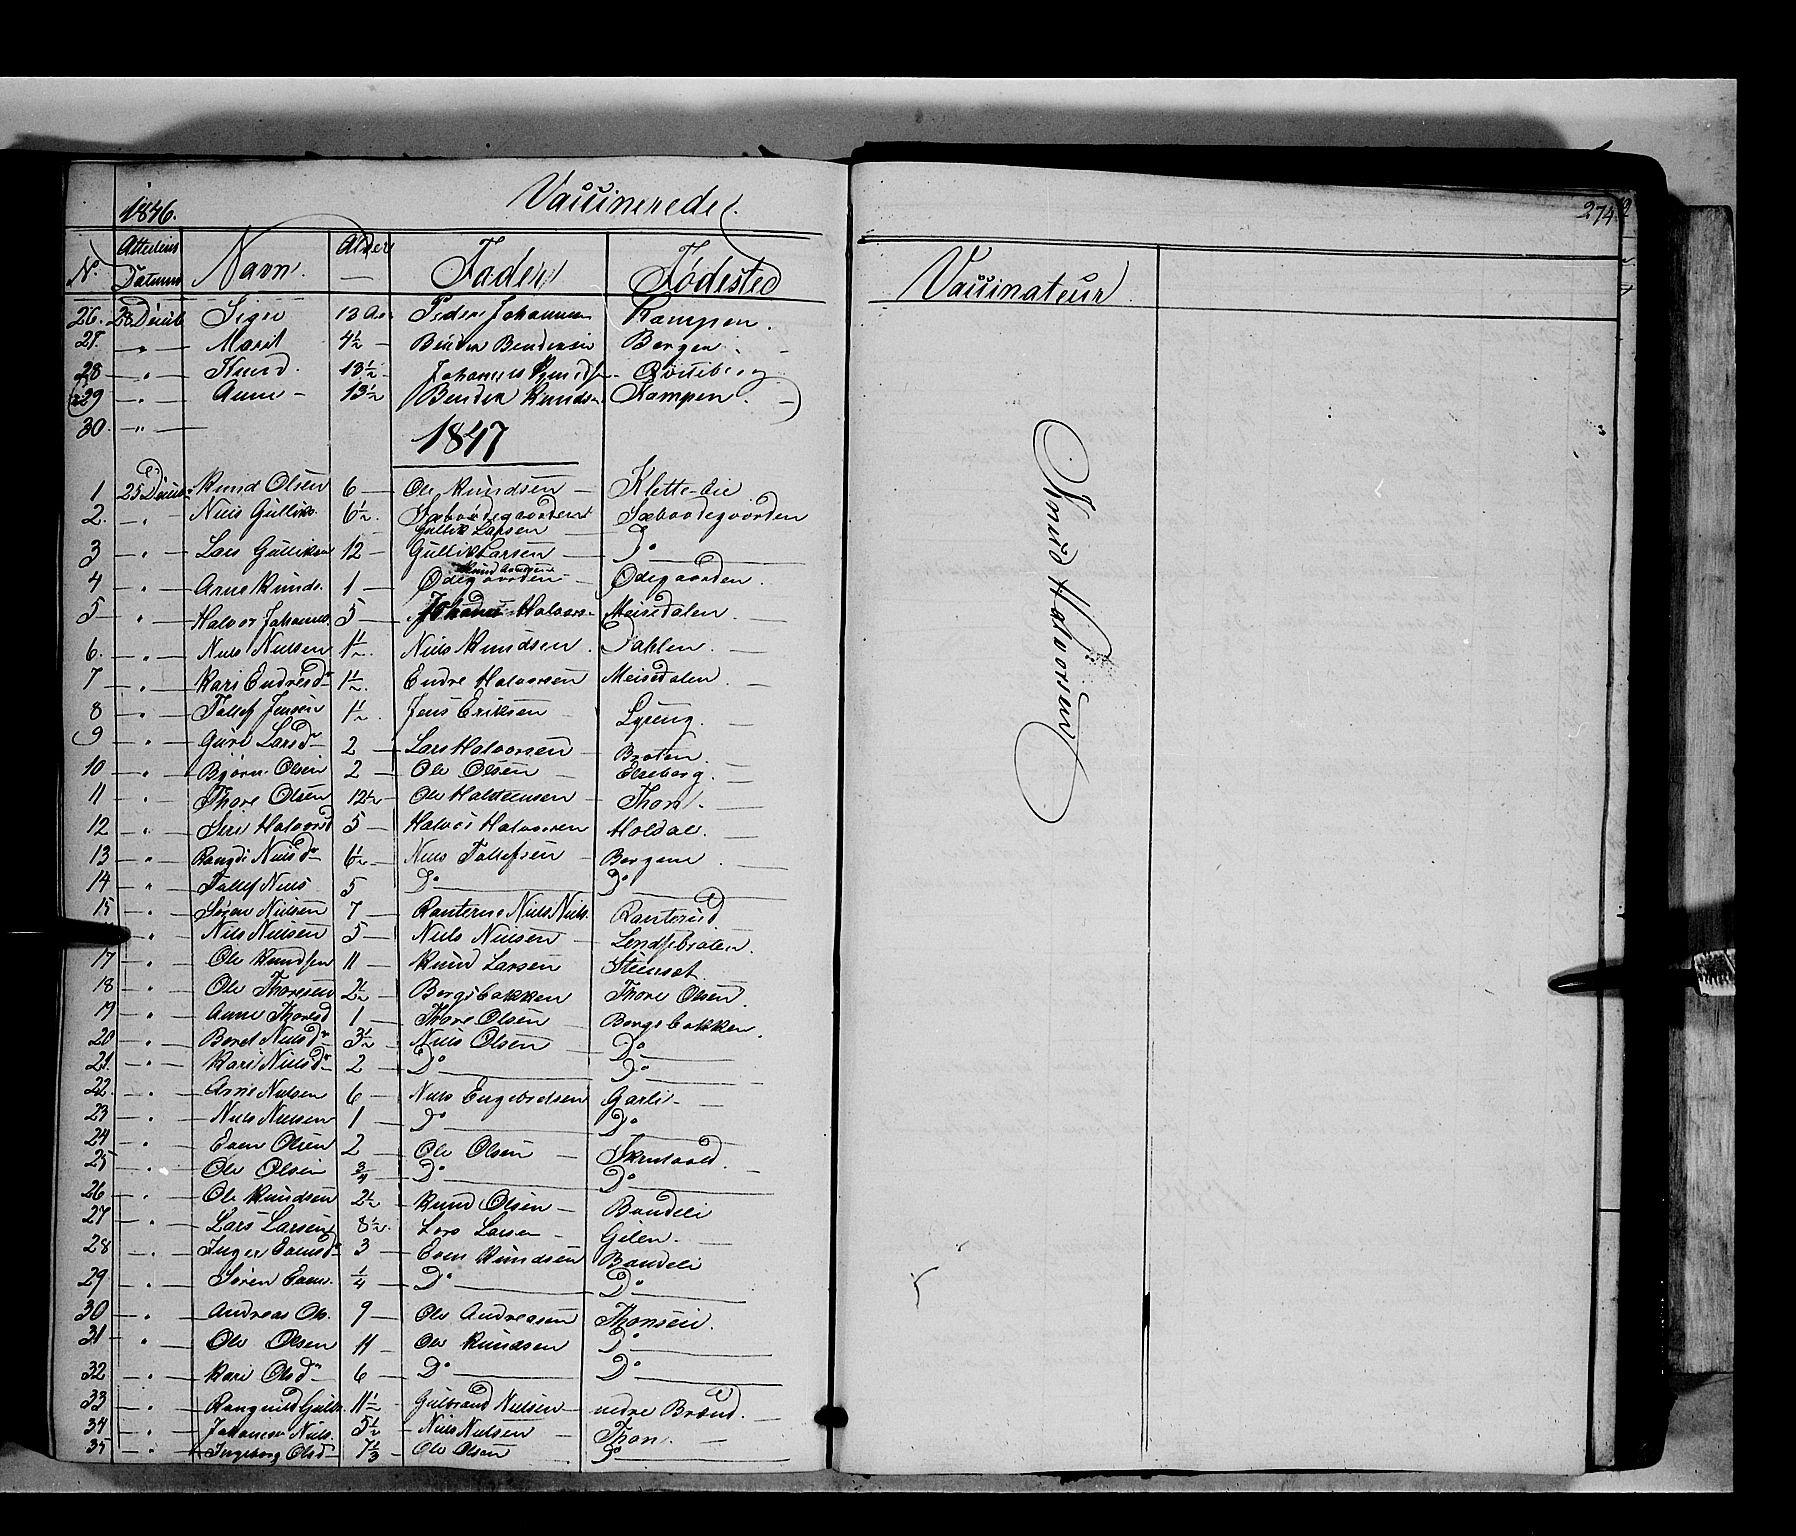 SAH, Nord-Aurdal prestekontor, Ministerialbok nr. 7, 1842-1863, s. 274